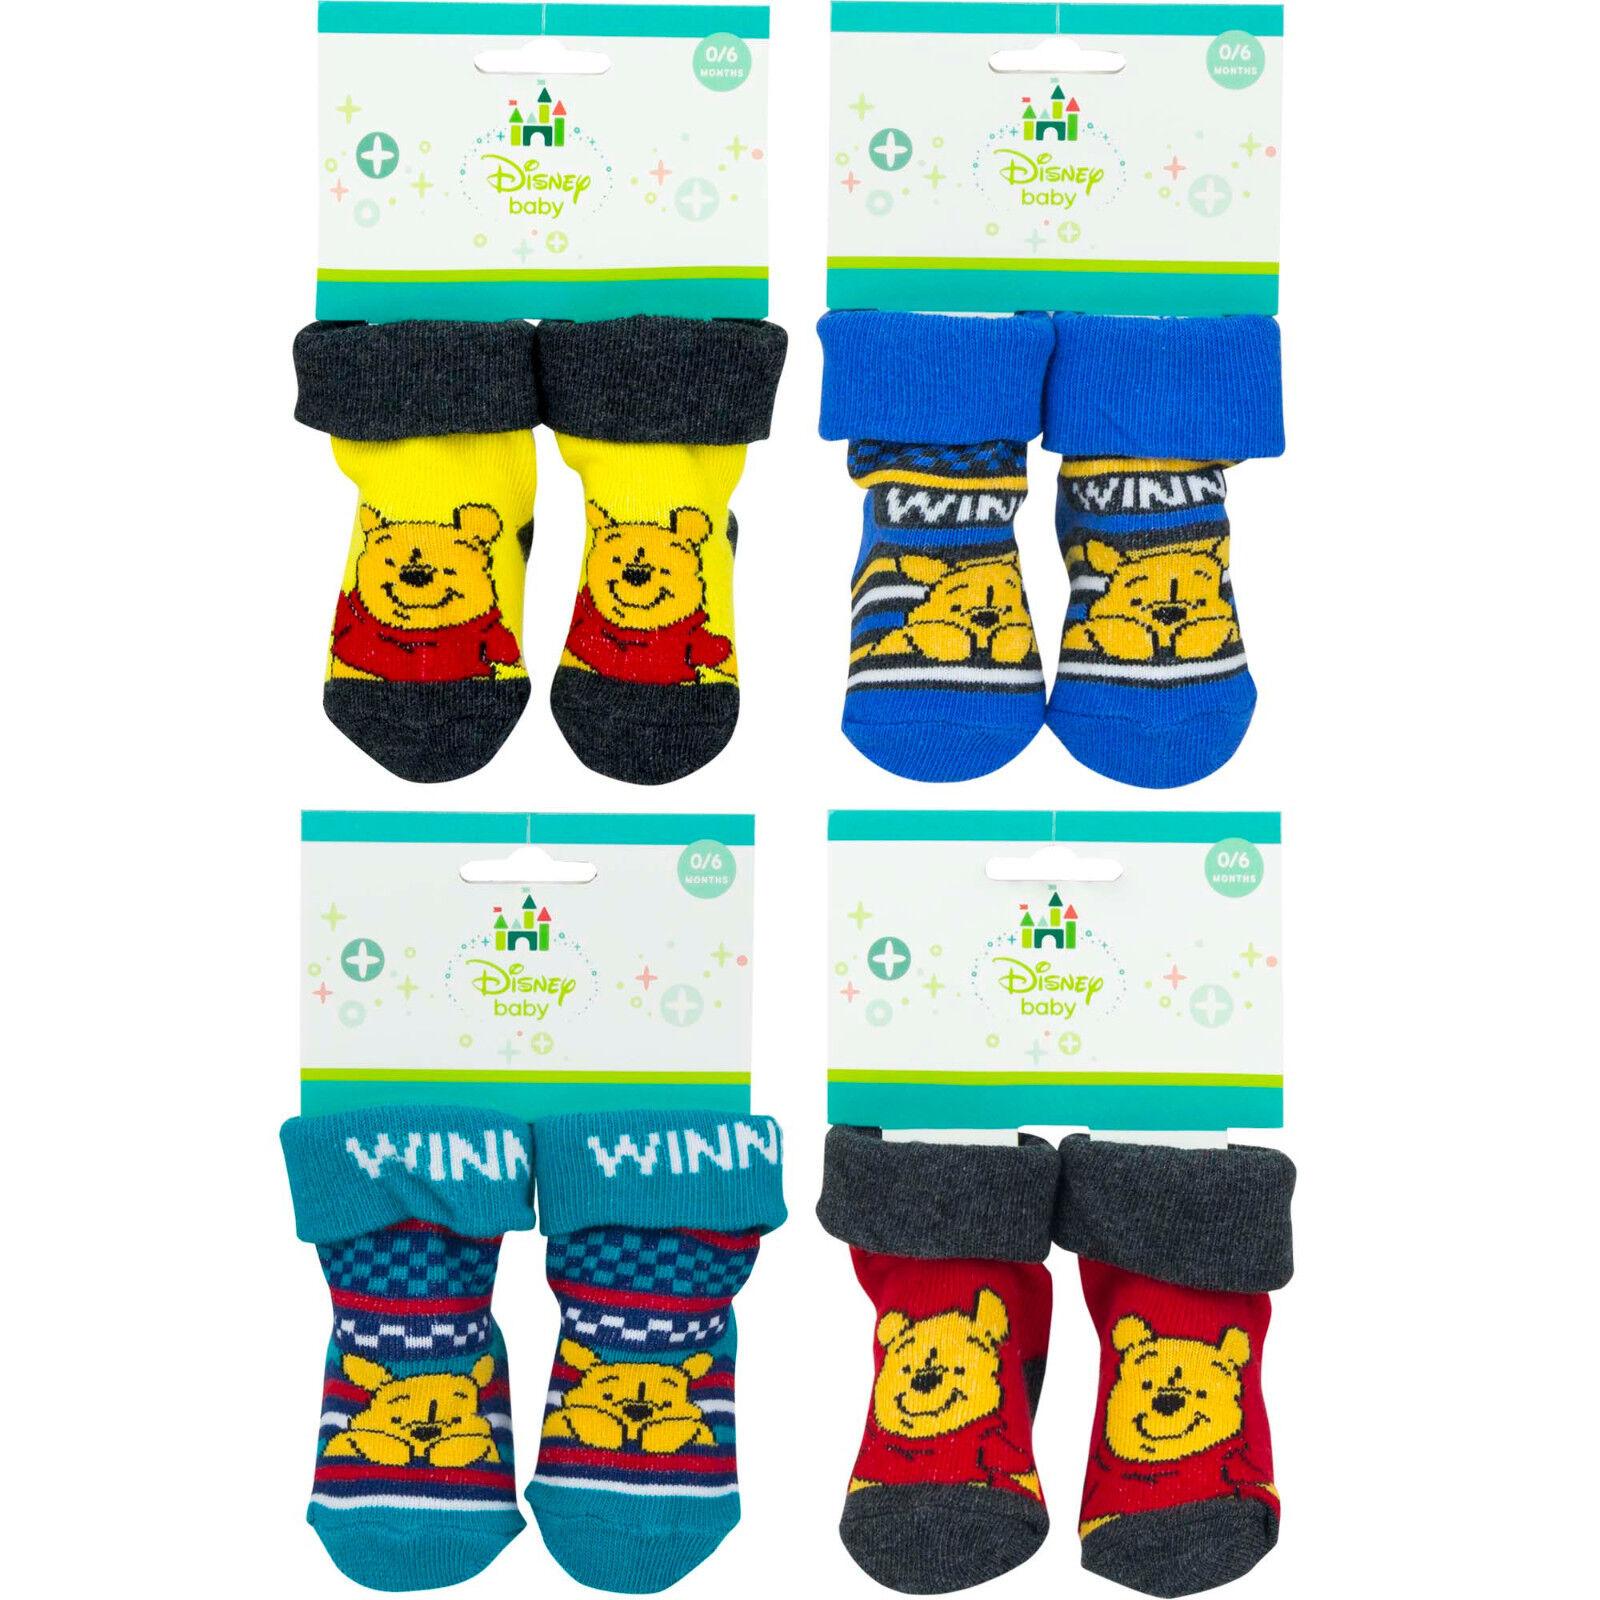 Disney Winnie Pooh Baby Socken Strümpfe Gr. 0-6 Monate 6-12 Monate Junge